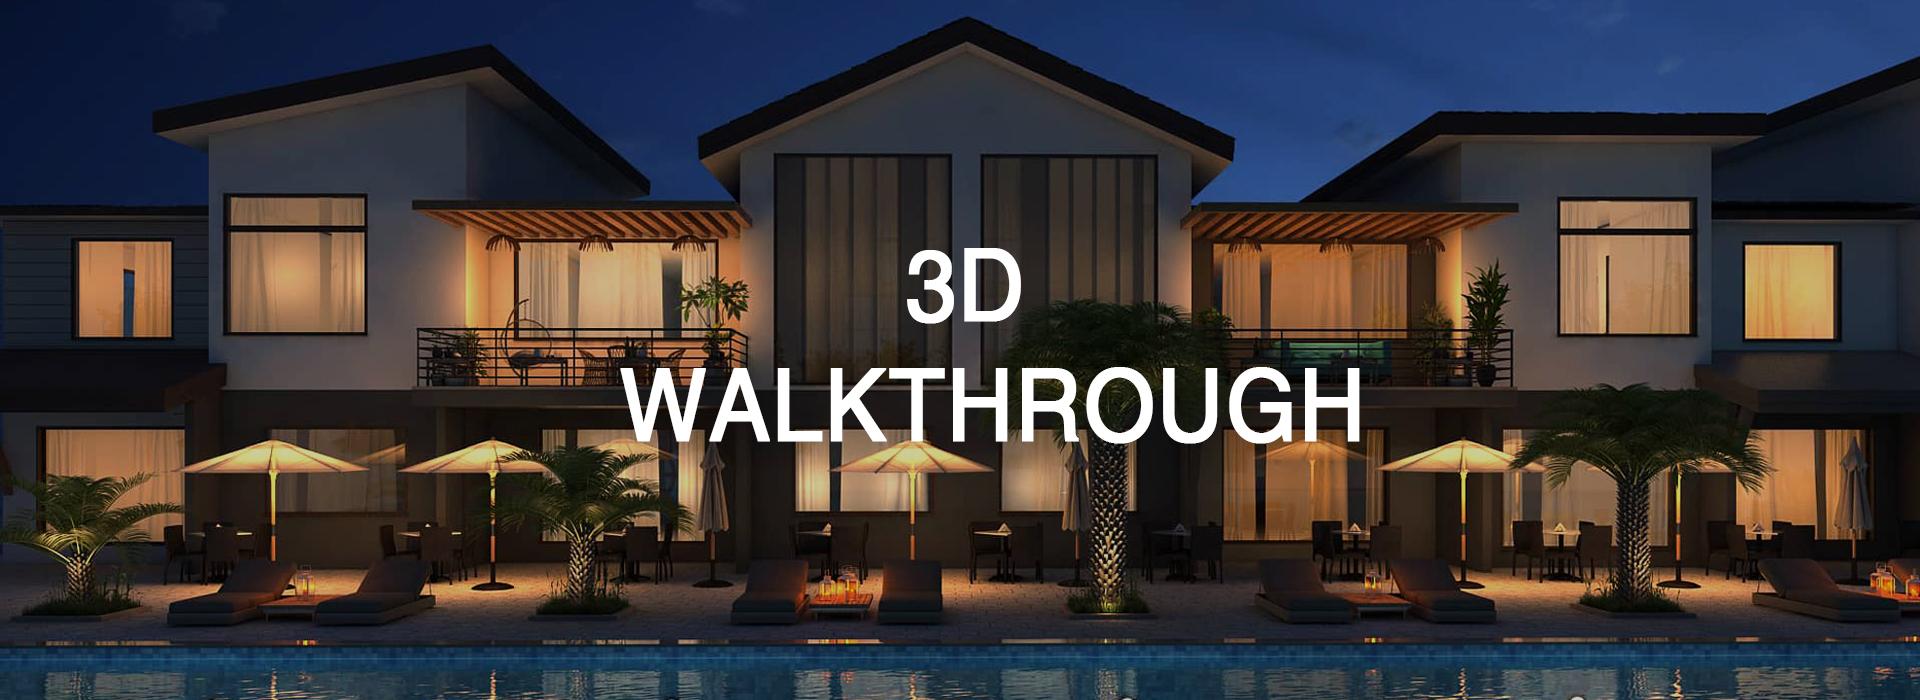 3D Walkthrough Animation Portfolio